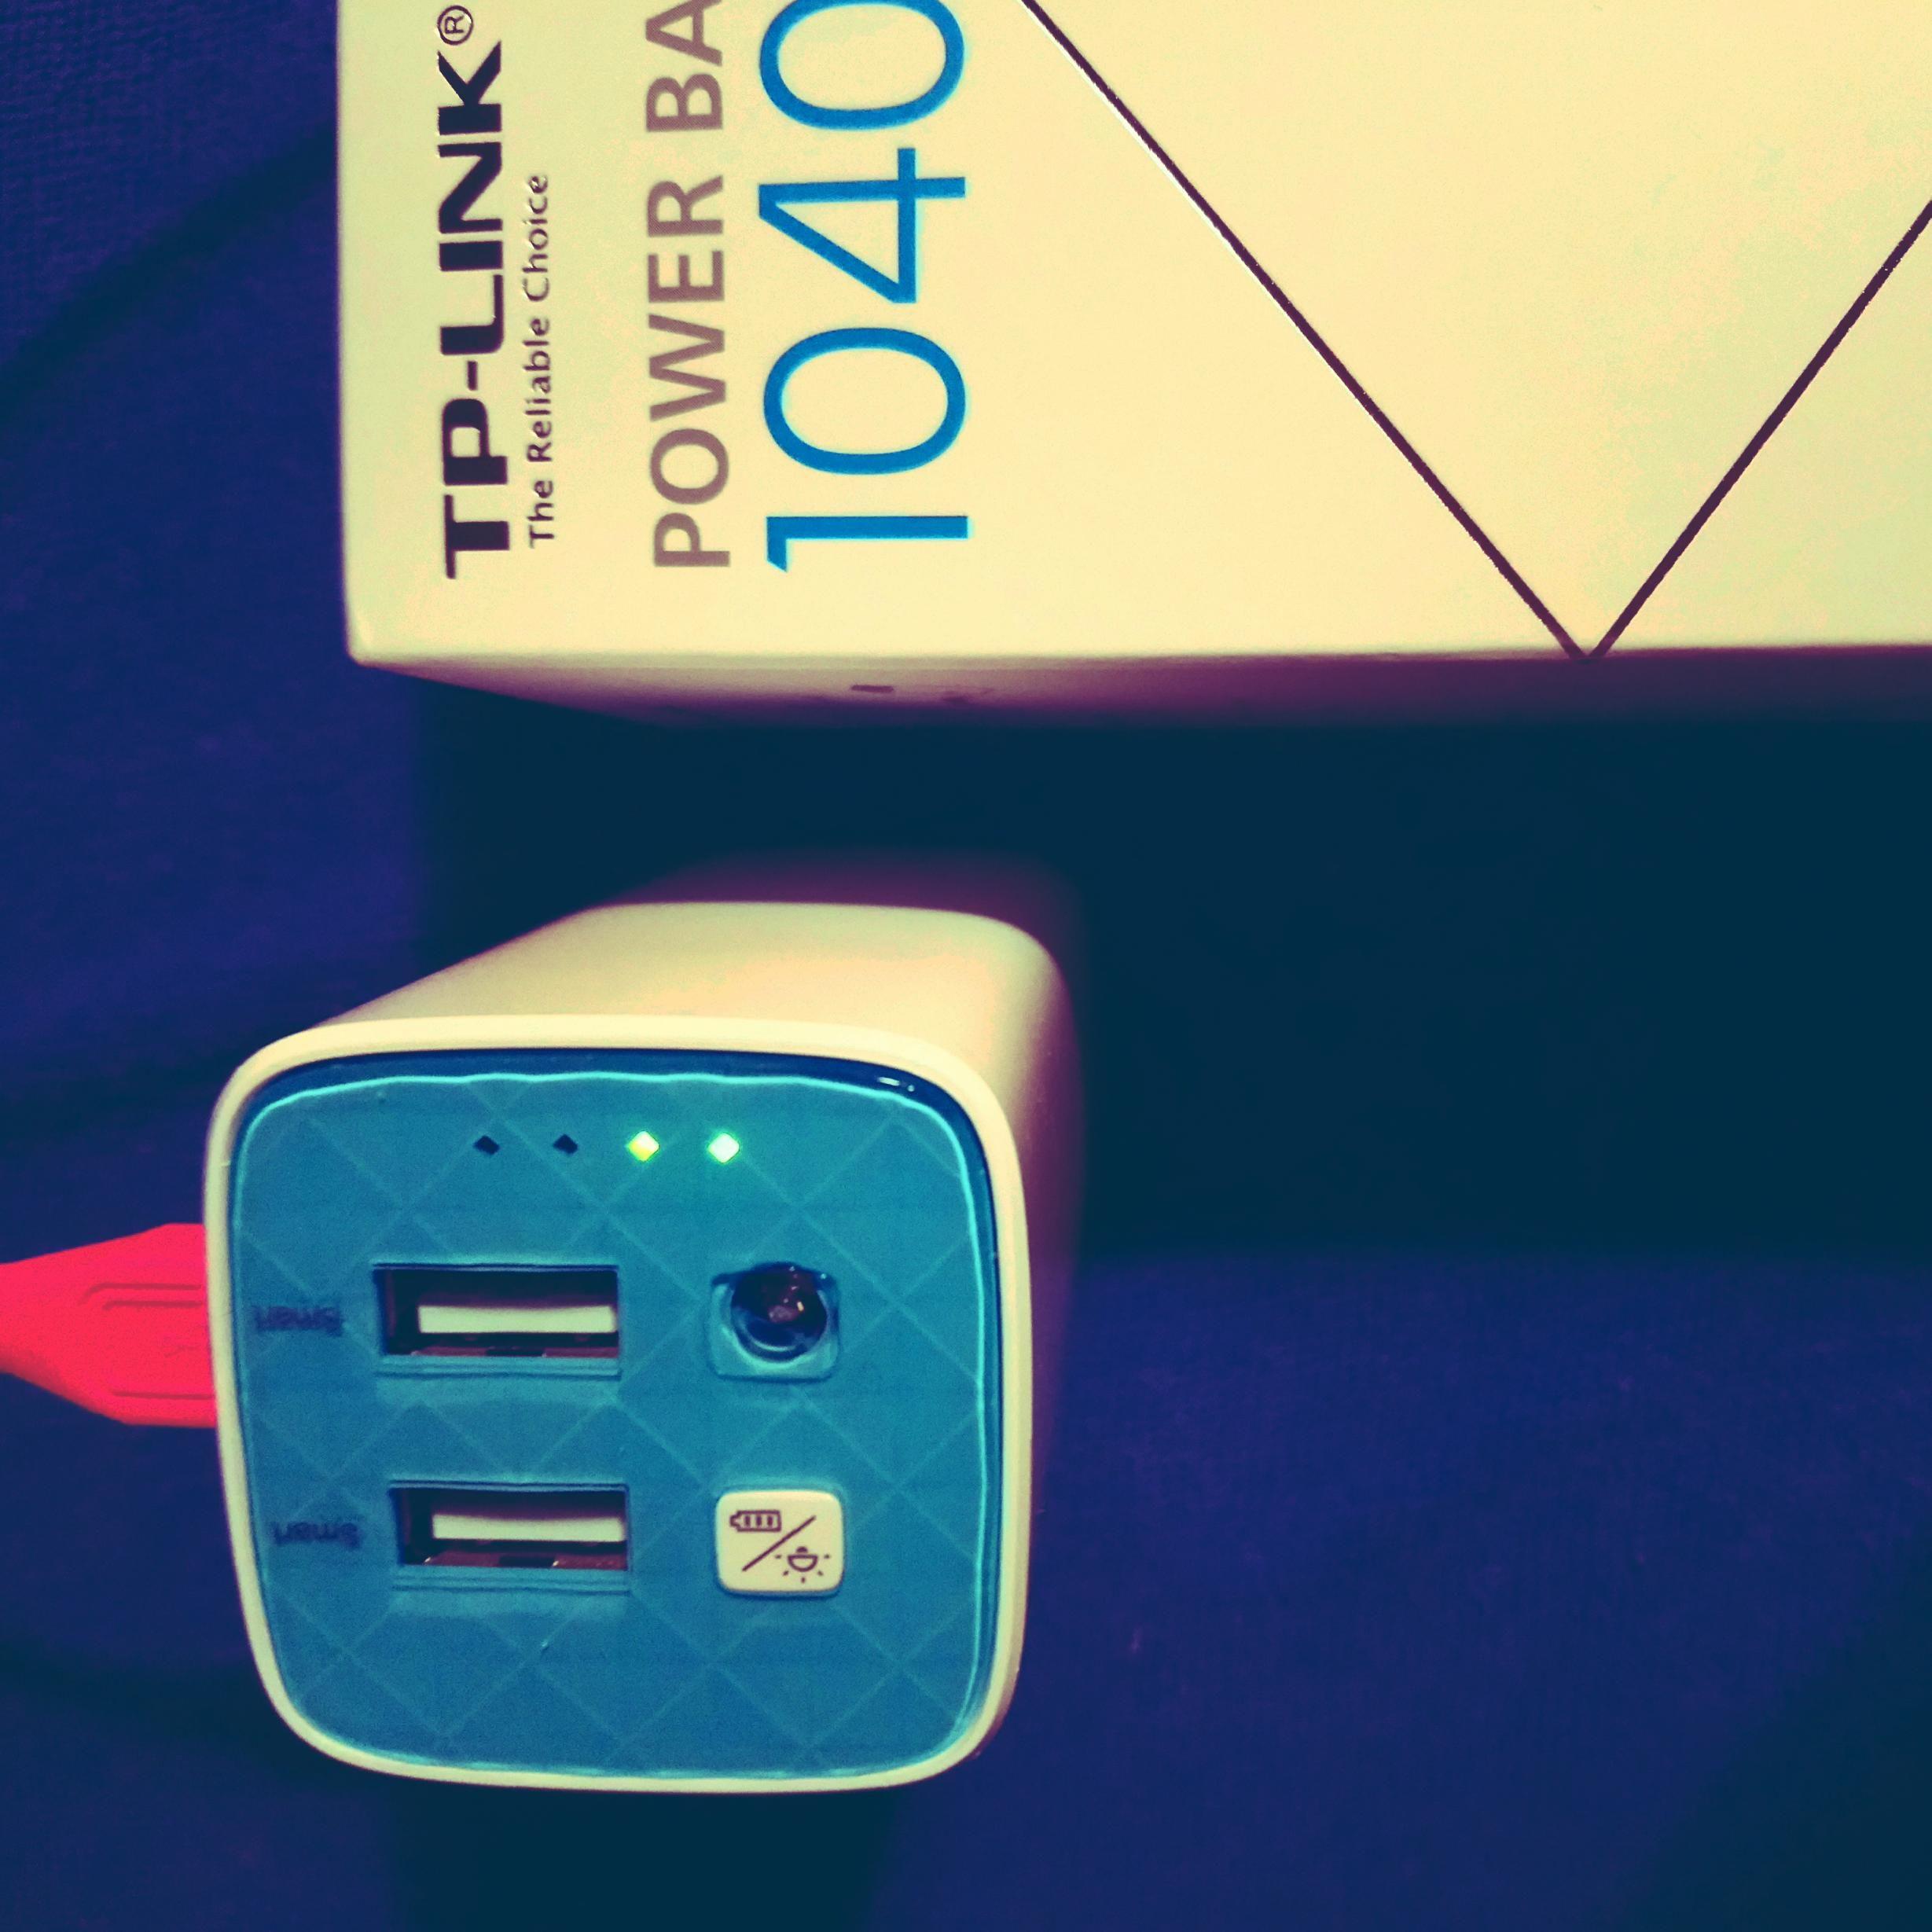 Selgros (w halach): TP Link TL-PB 10400 mAh, power bank 2xUSB out, z latarką